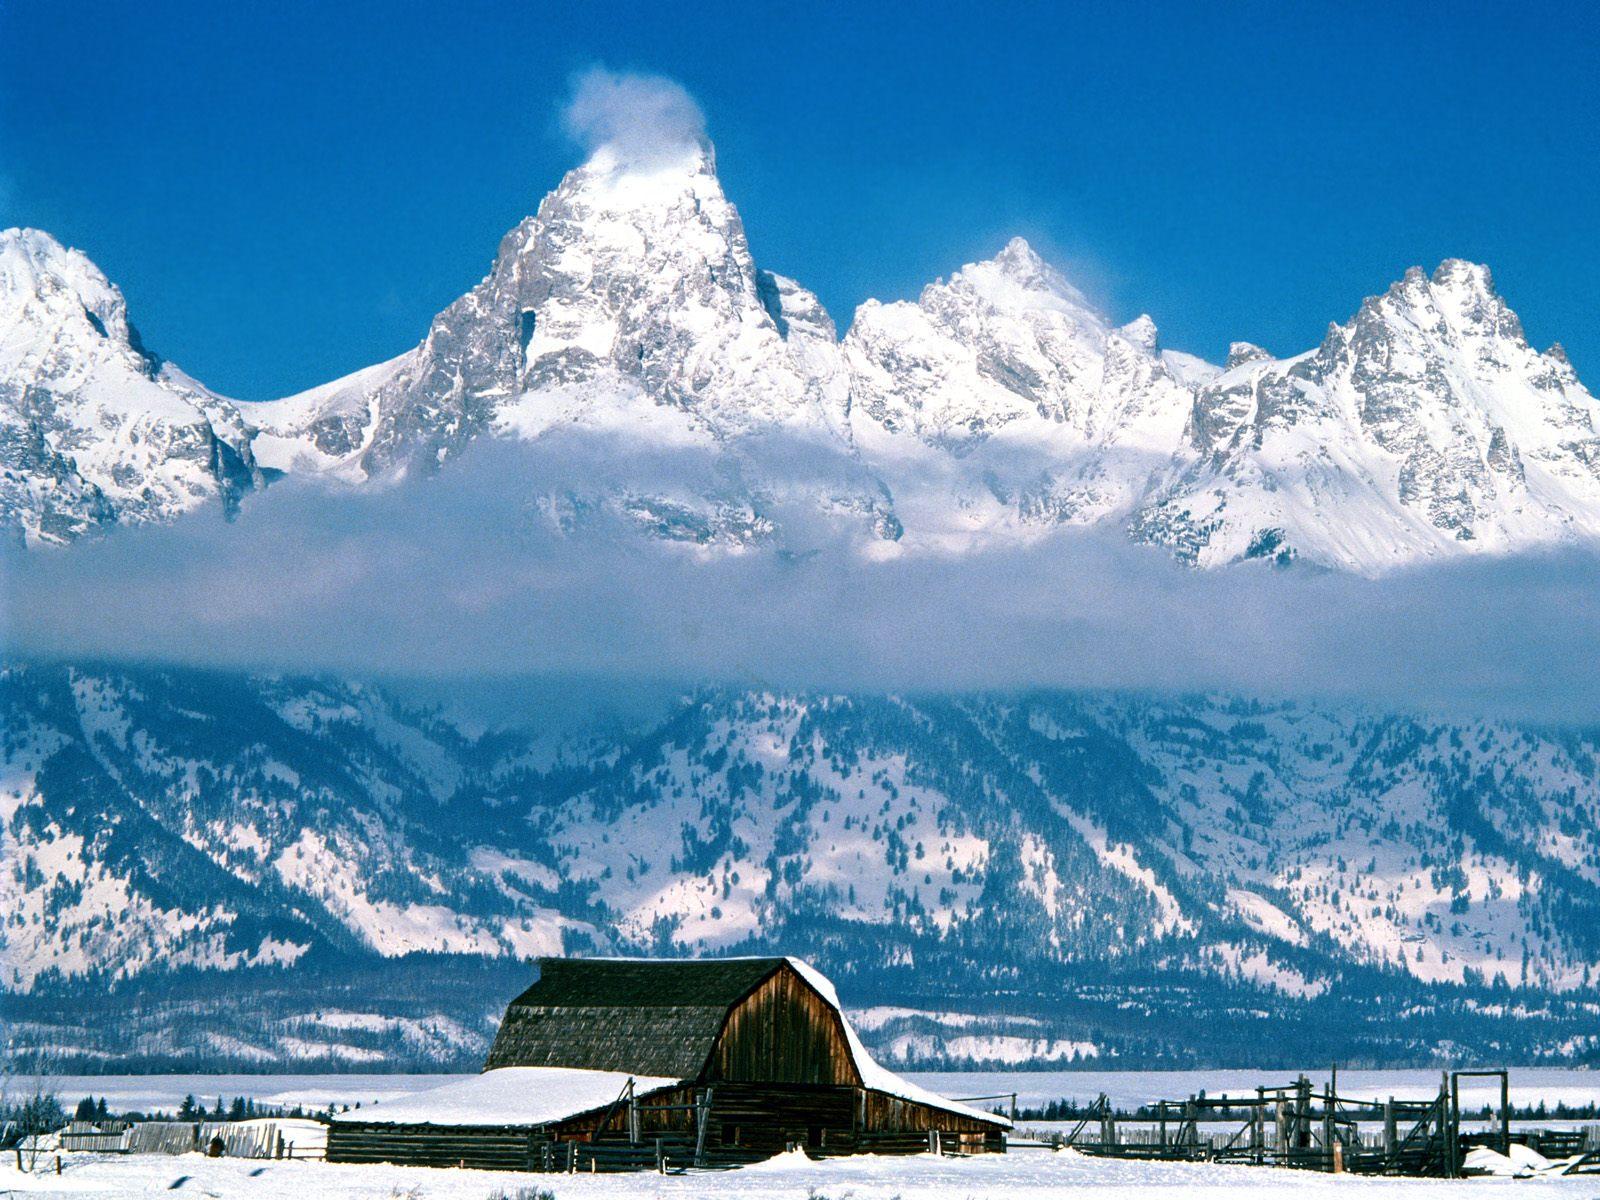 Amazing Wallpaper Mountain Christmas - 17  Trends_97214.jpg